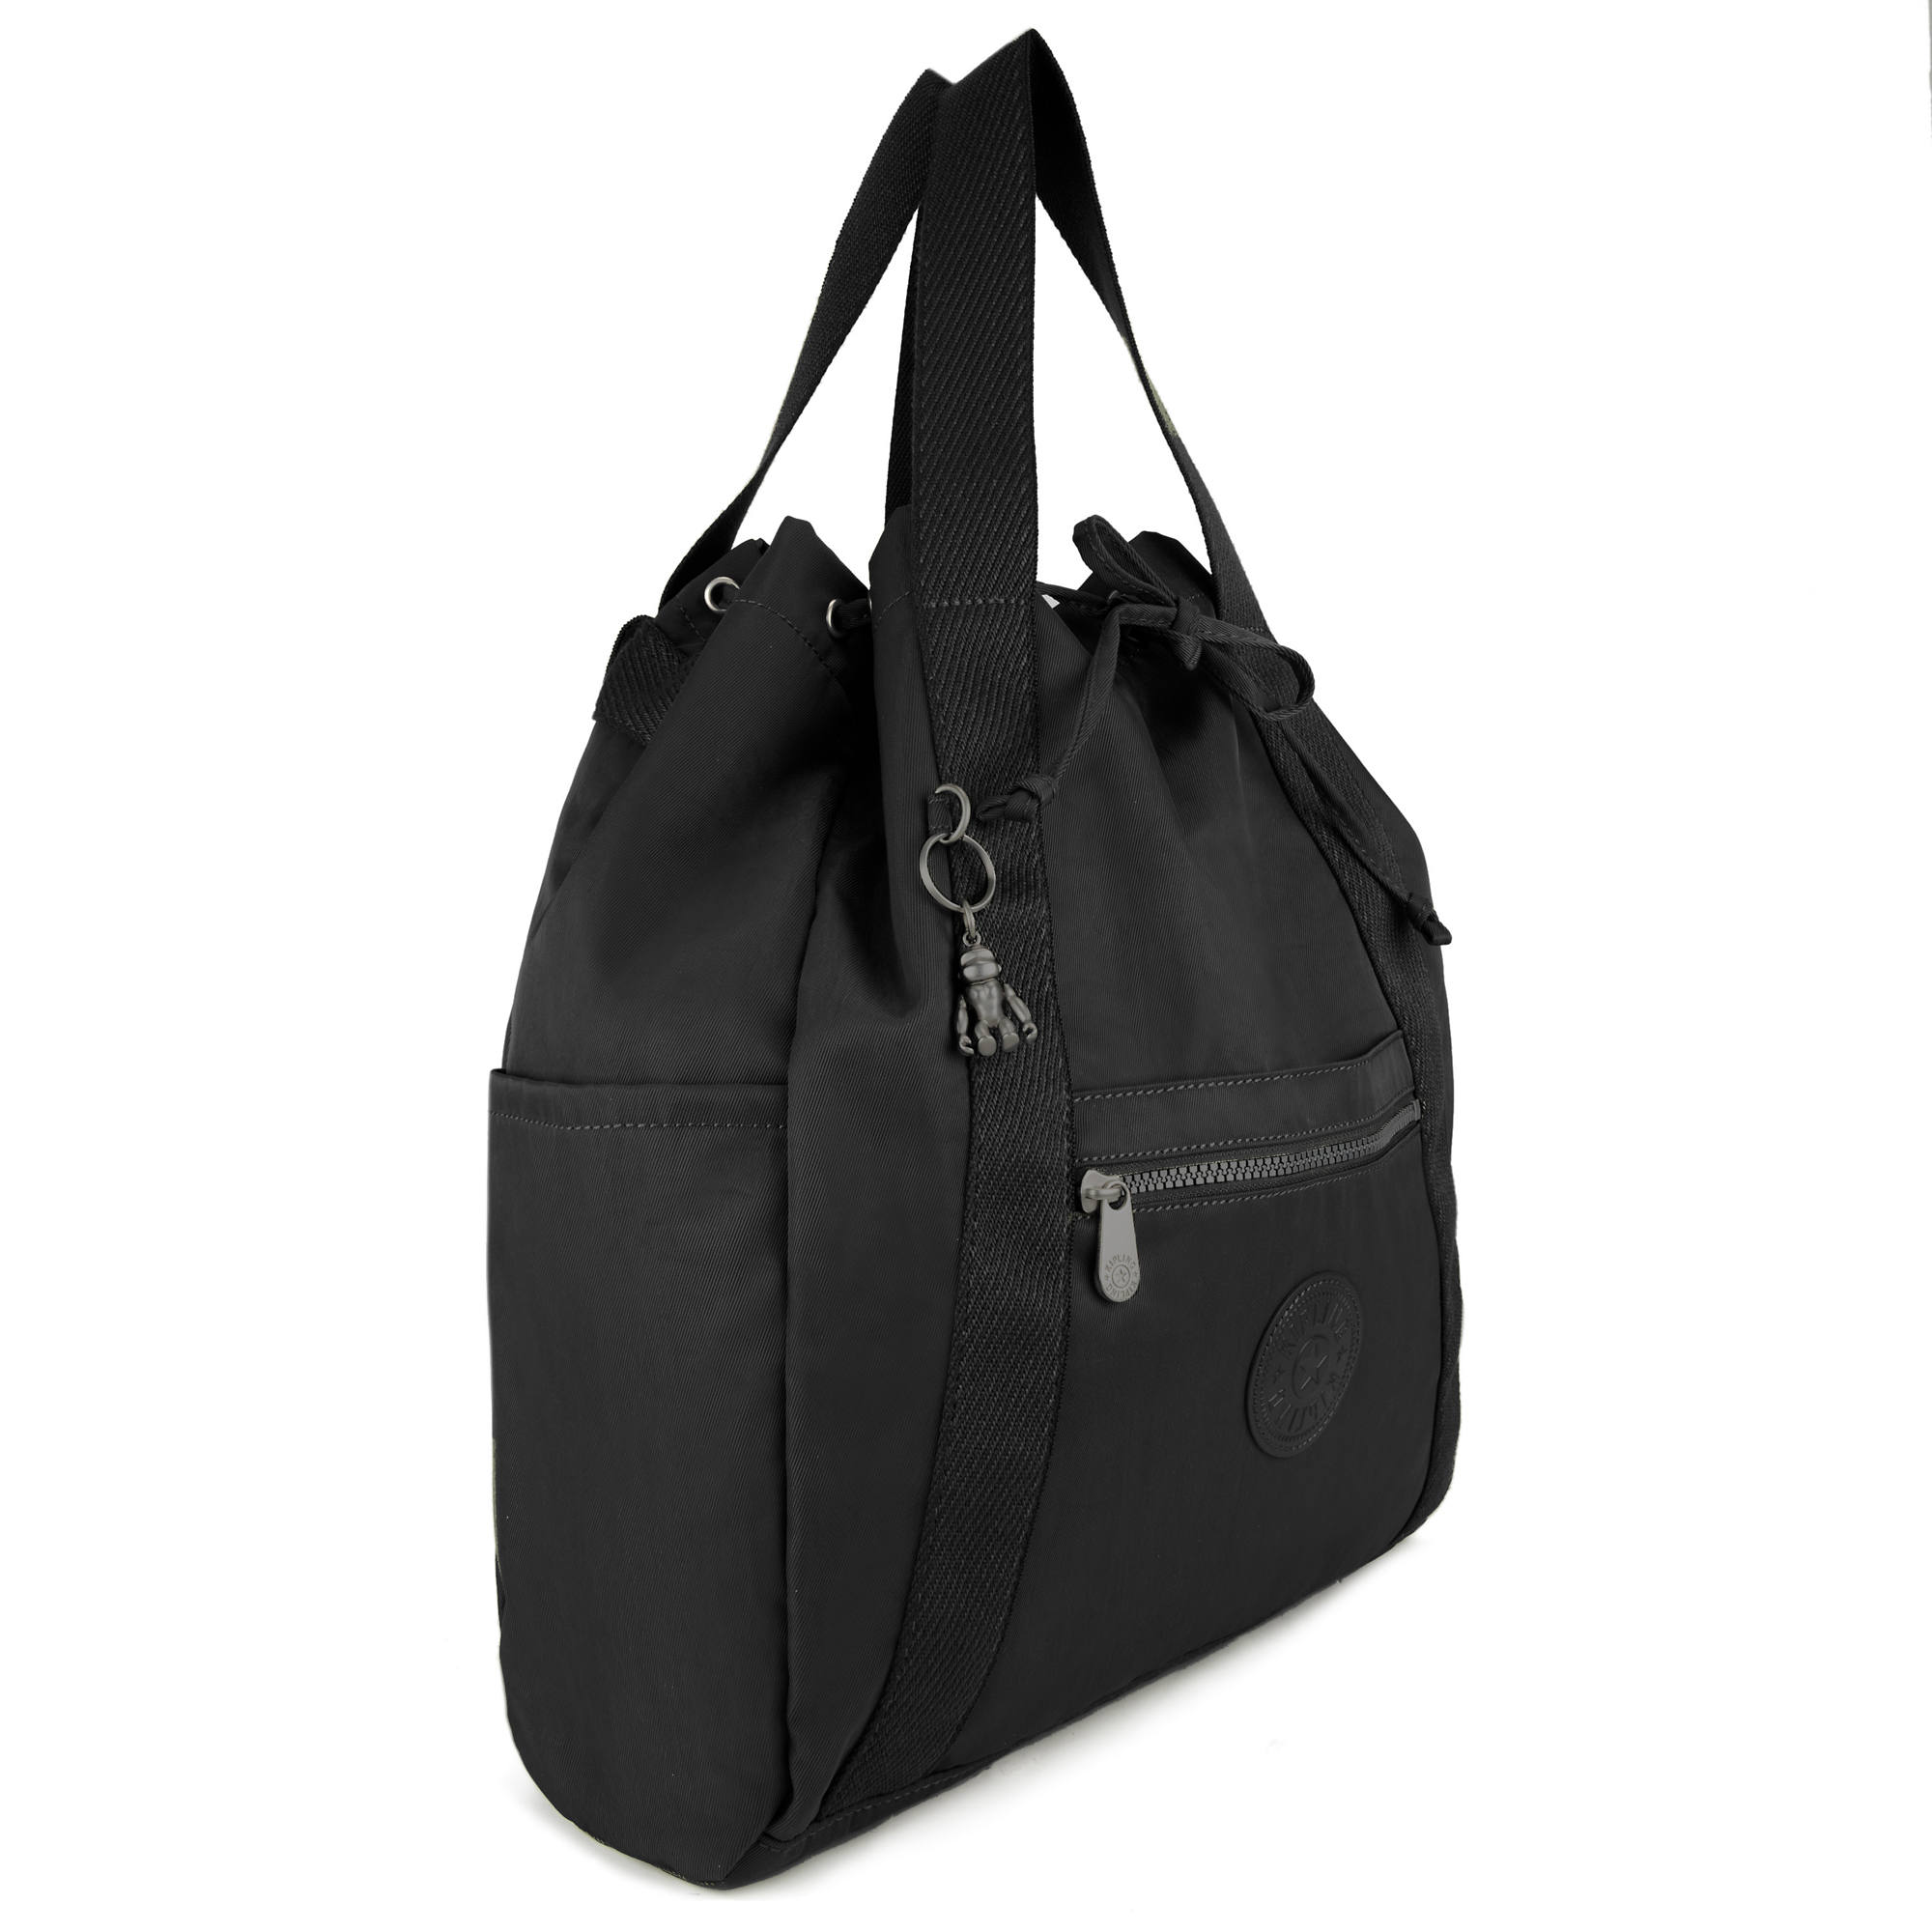 e26dc9e12543 Kipling Art Medium Tote Backpack